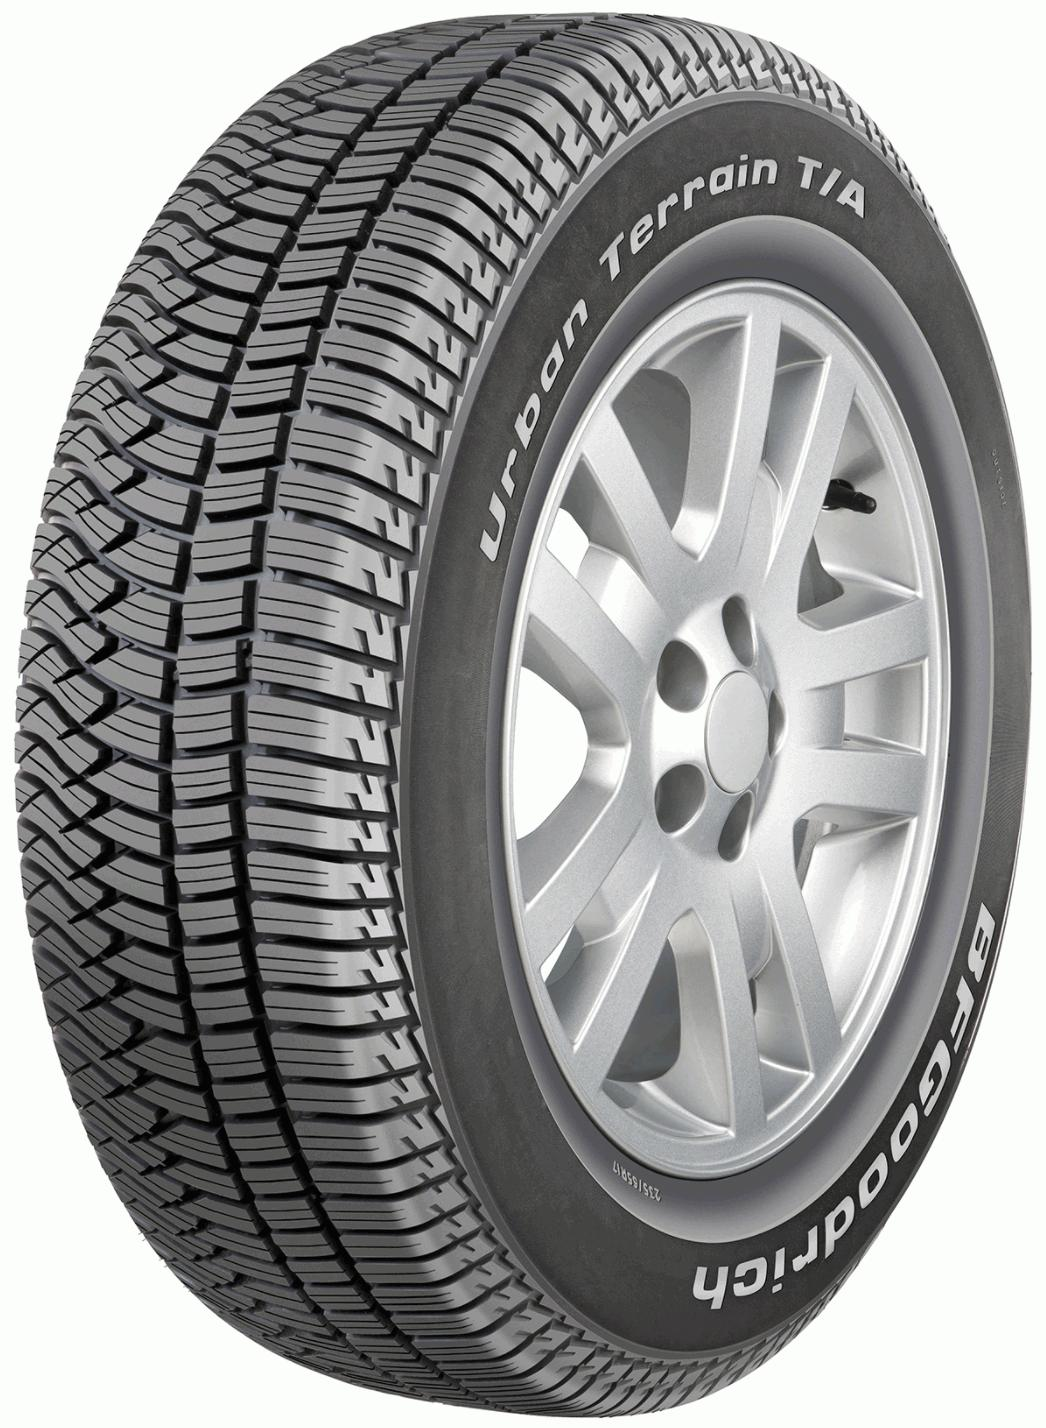 Bfgoodrich Urban Terrain Ta Tyre Reviews